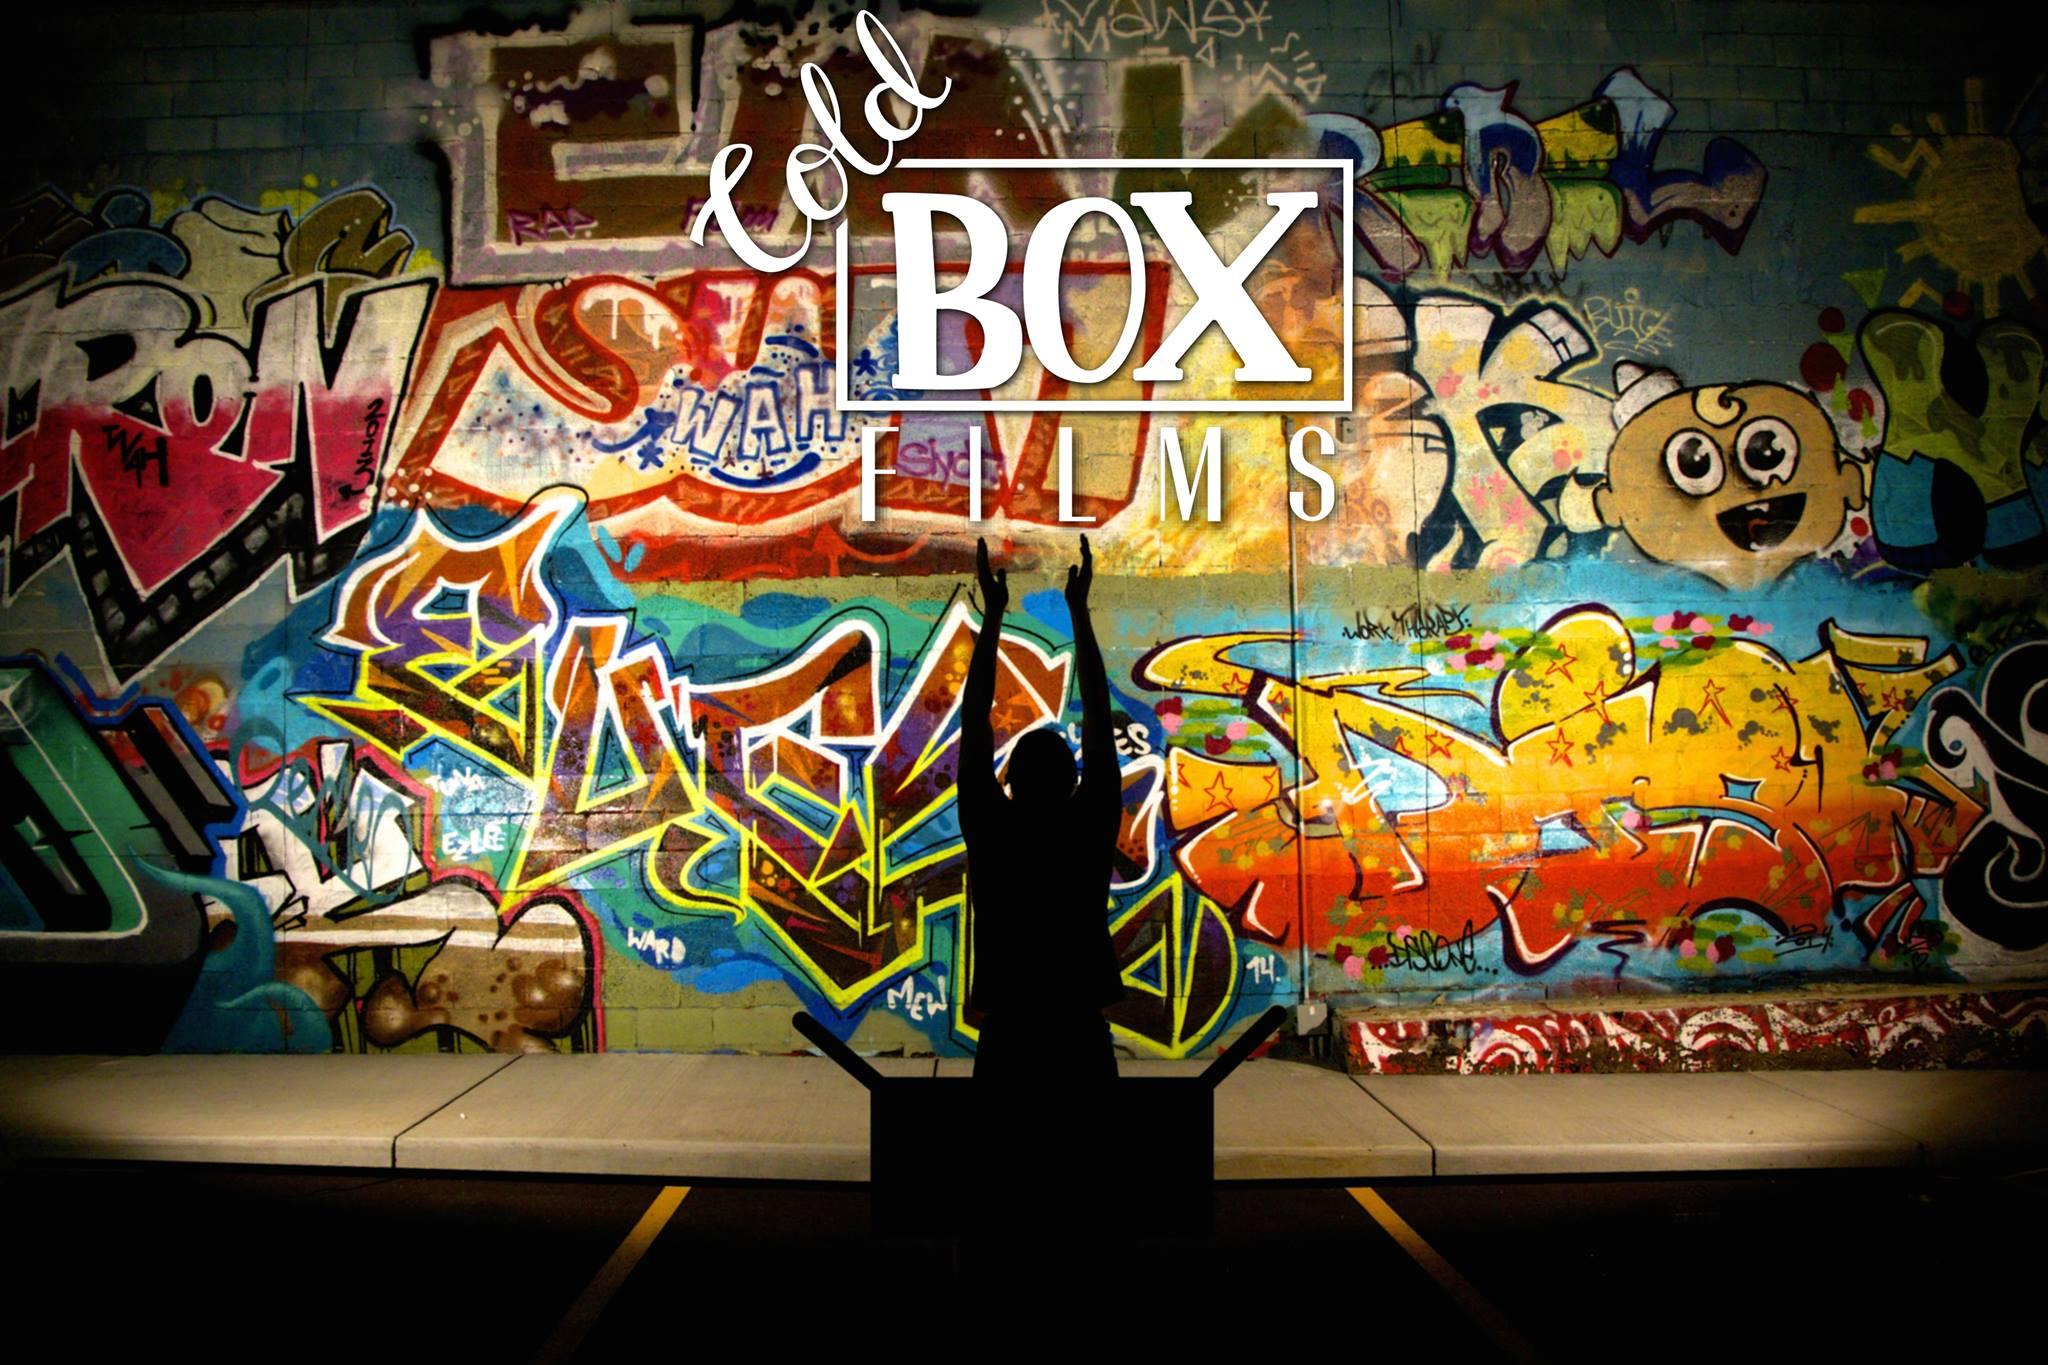 Cold Box Films